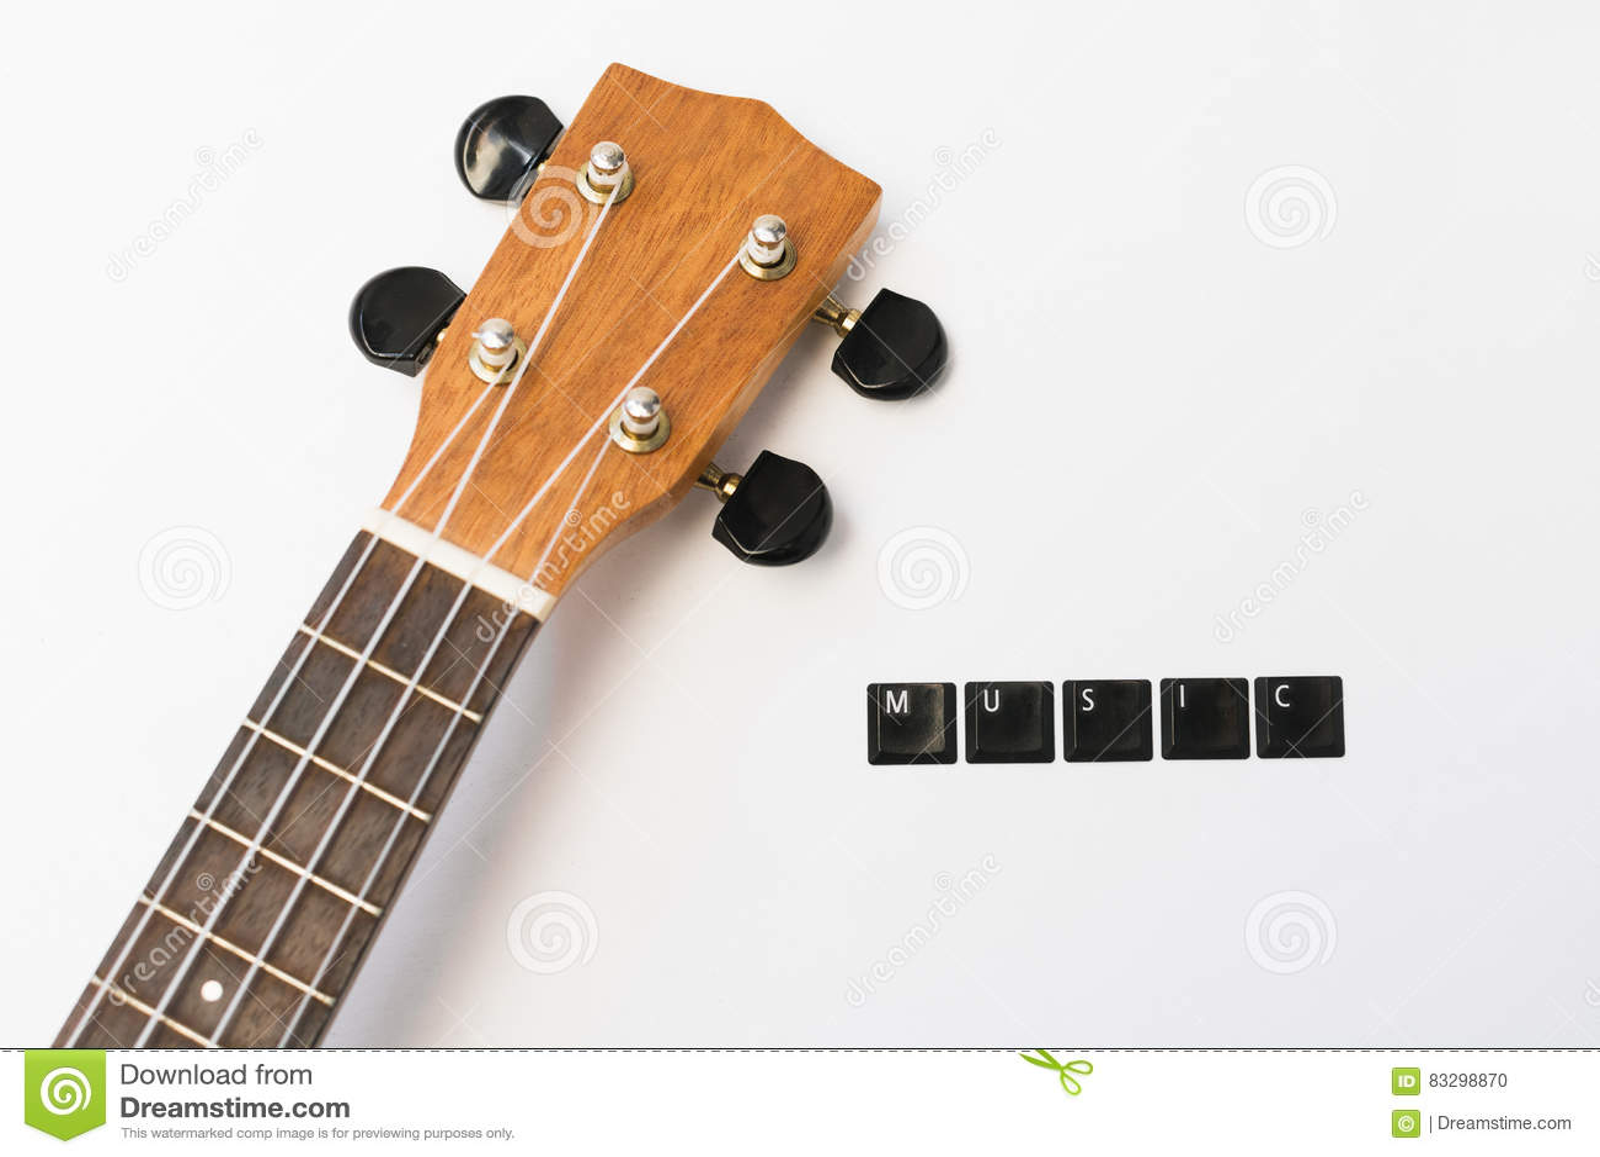 Ukulele liebt Musik lokalisierten Hintergrund